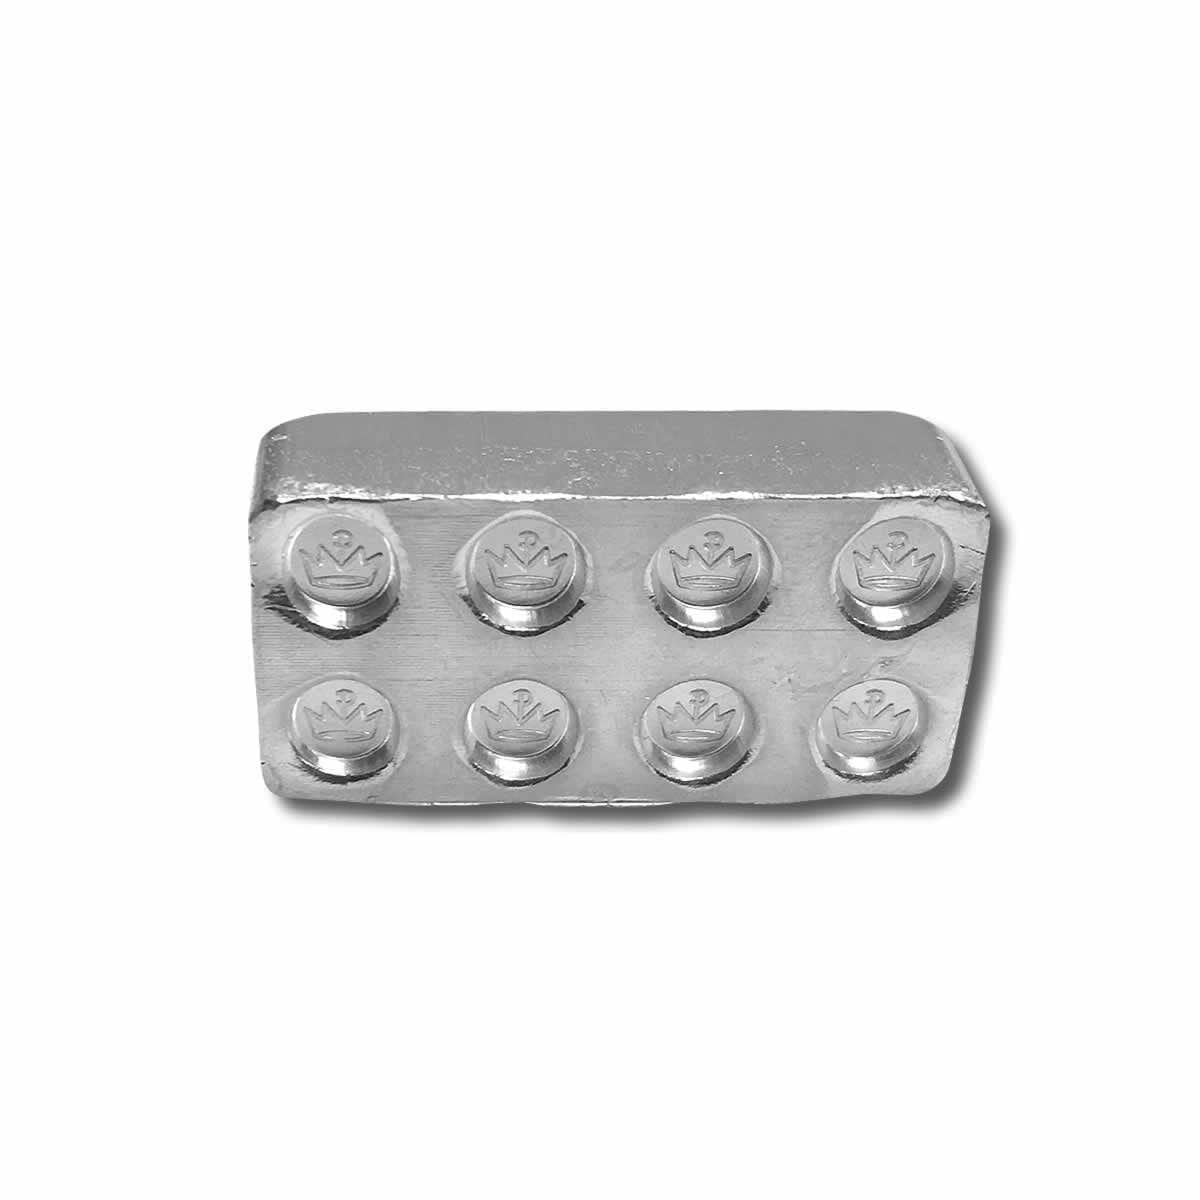 The Starter Kit - 12x 1oz .999 Silver Building Blocks Bars 4